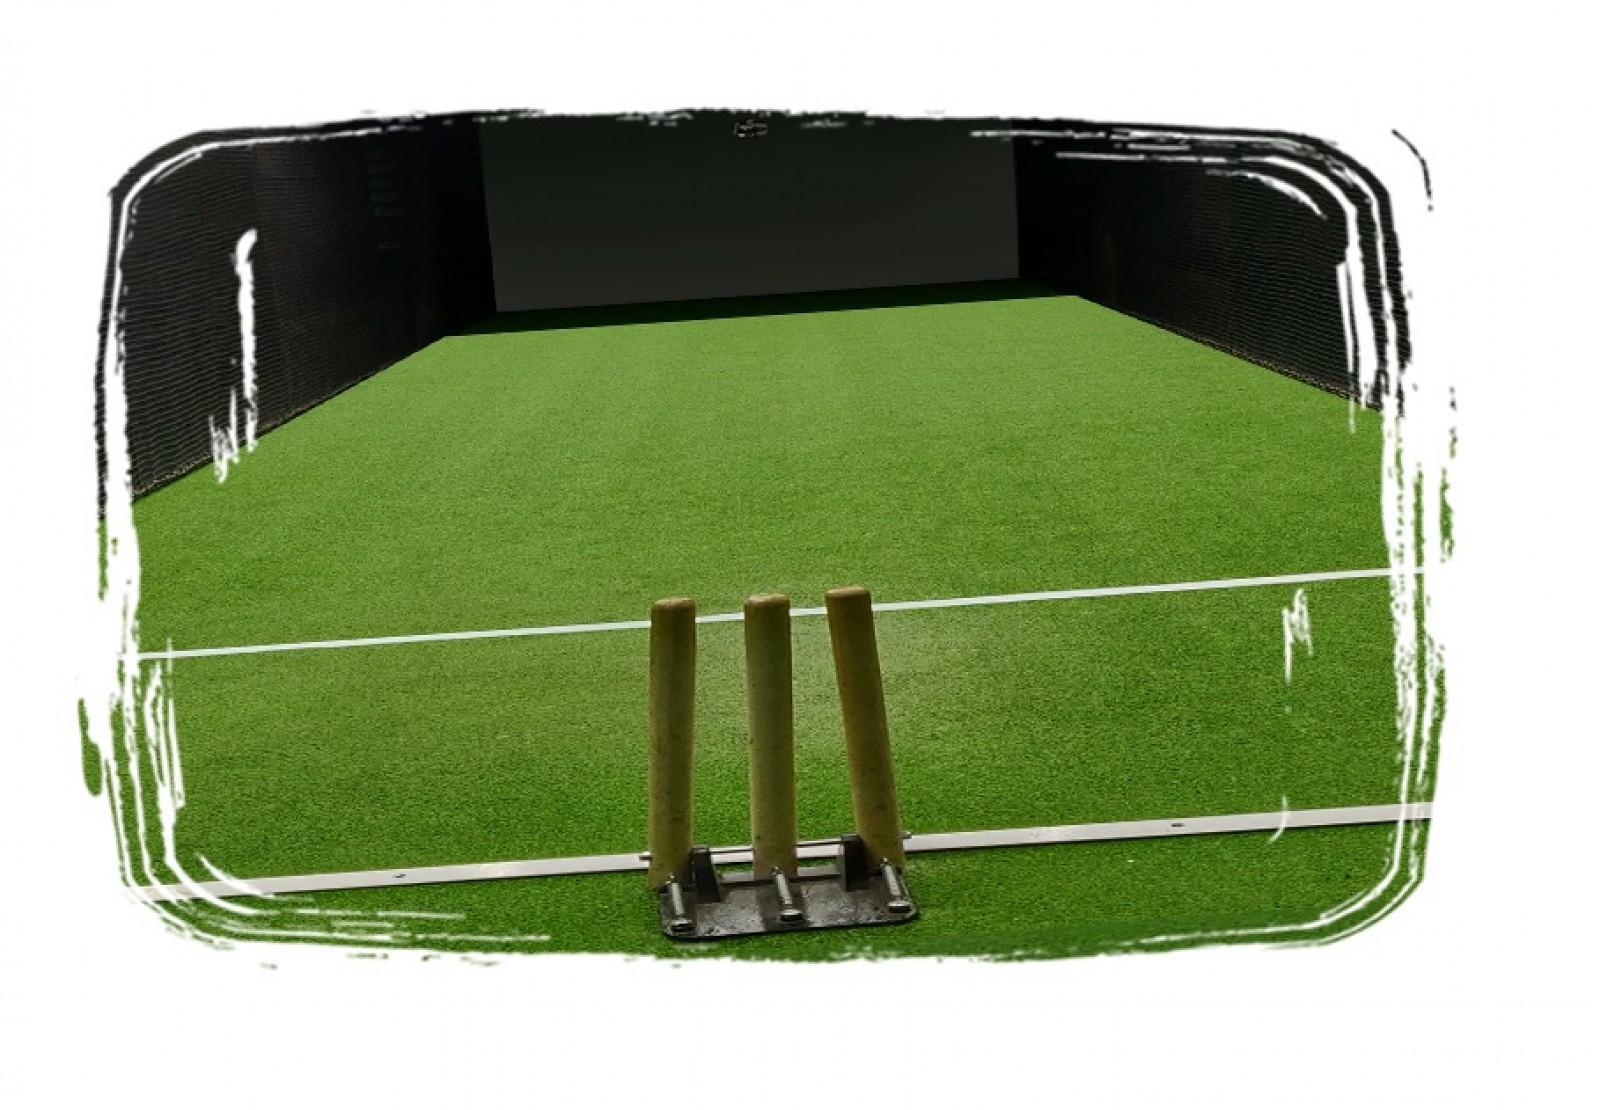 http://www.thegreatnext.com/Cricket Simulator Rishikesh Uttarakhand Thrill Factory Park Adventure Travel The Great Next